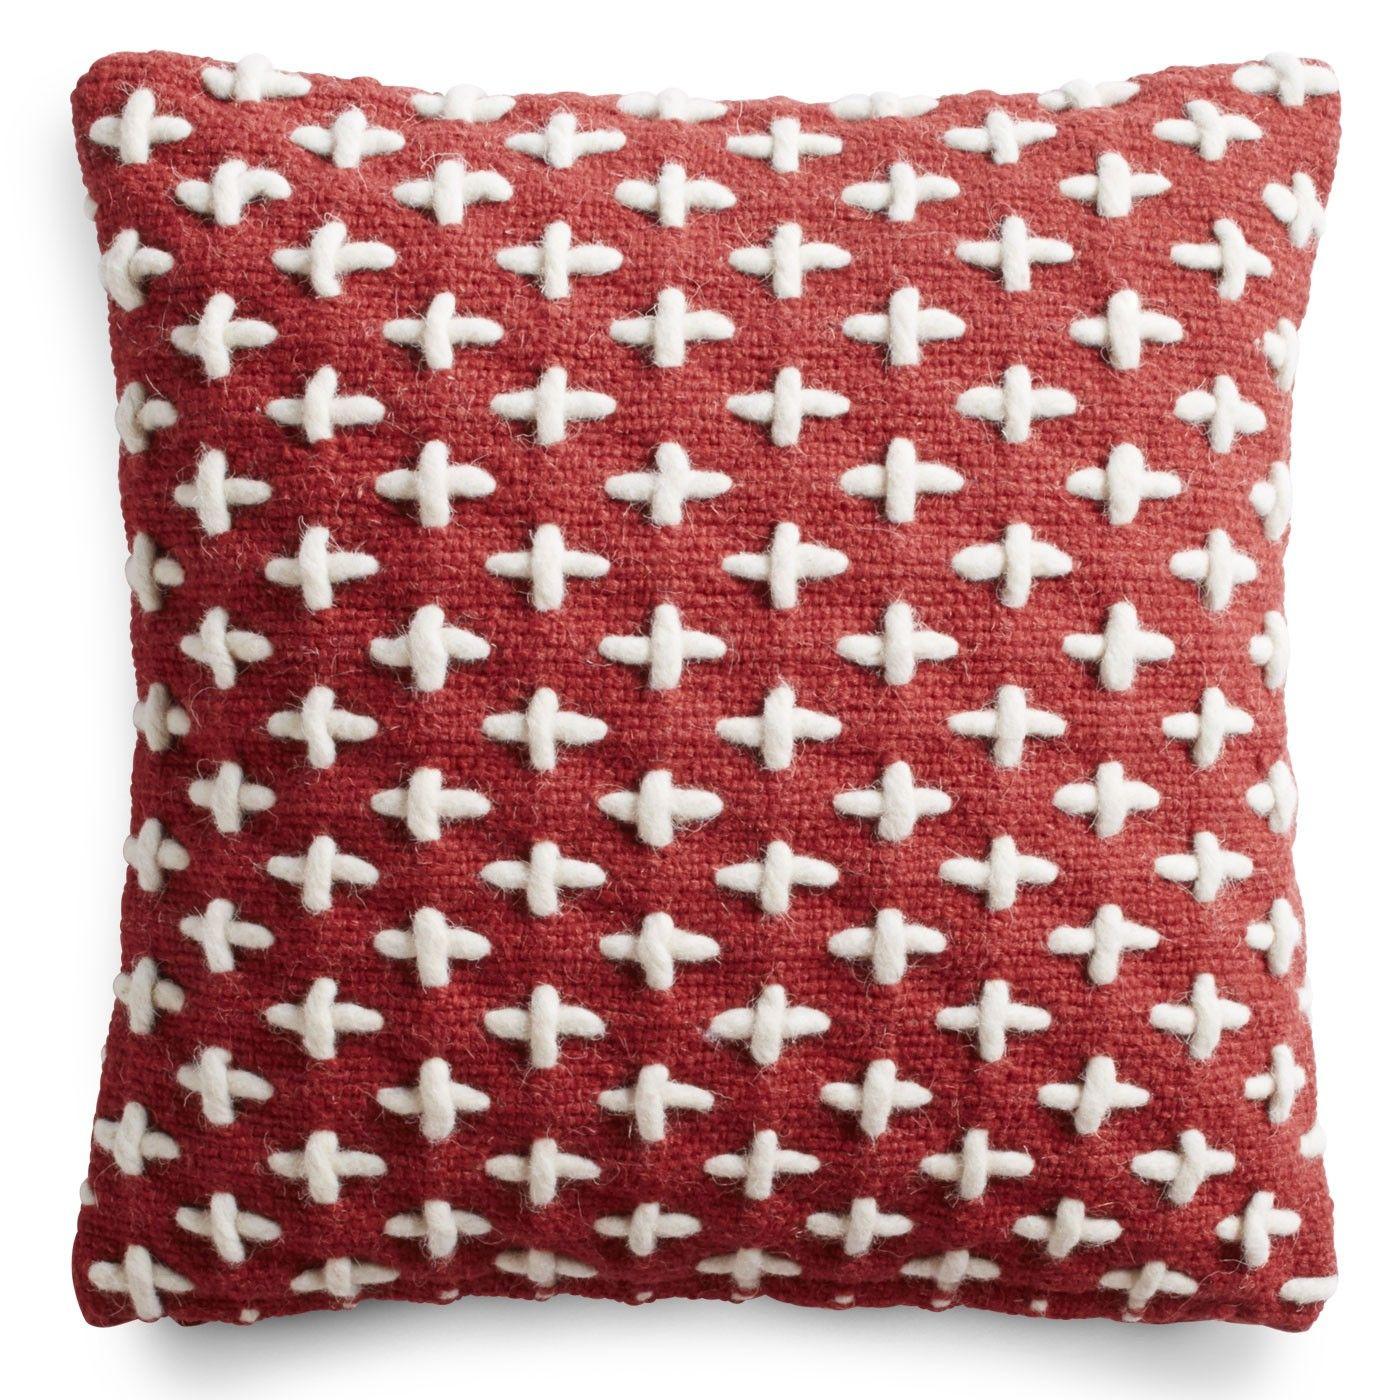 Mima Wool Pillow - Red Throw Pillows | Blu Dot | Noe Valley House ...